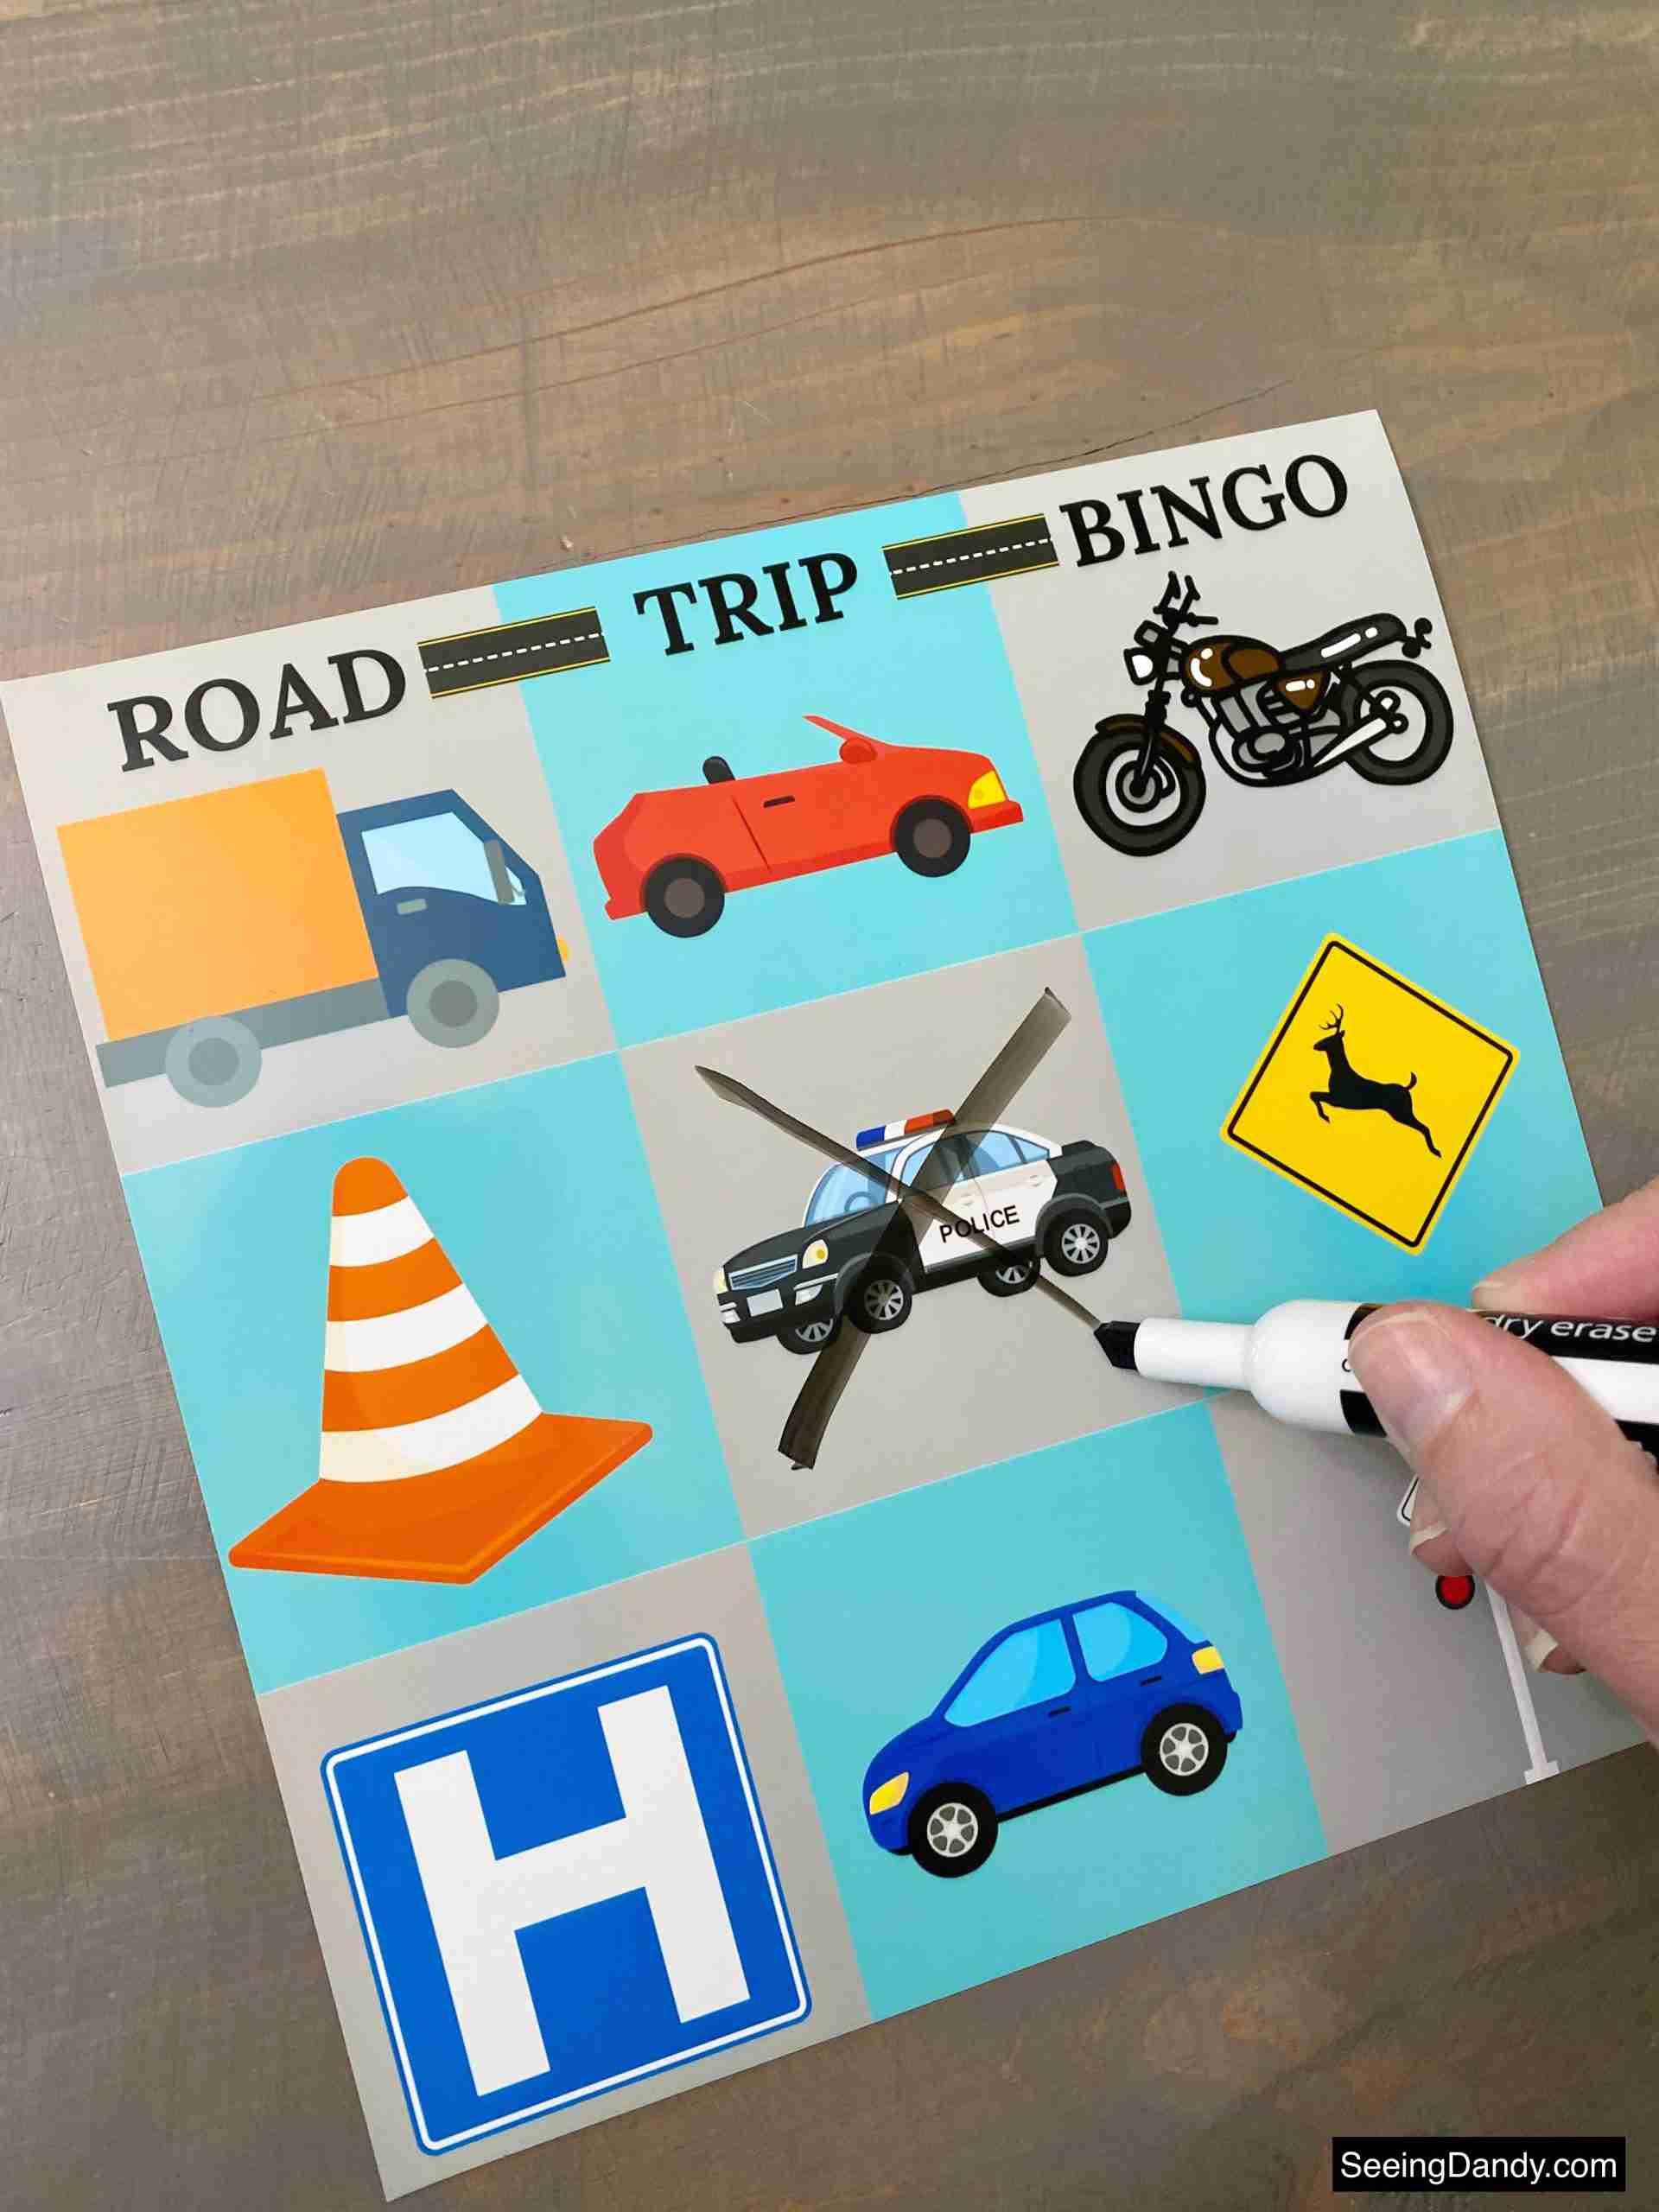 road trip bingo printable, dry erase bingo card, travel bingo, family travel, family vacation, road trip vacation, cross country travel, black expo dry eraser marker